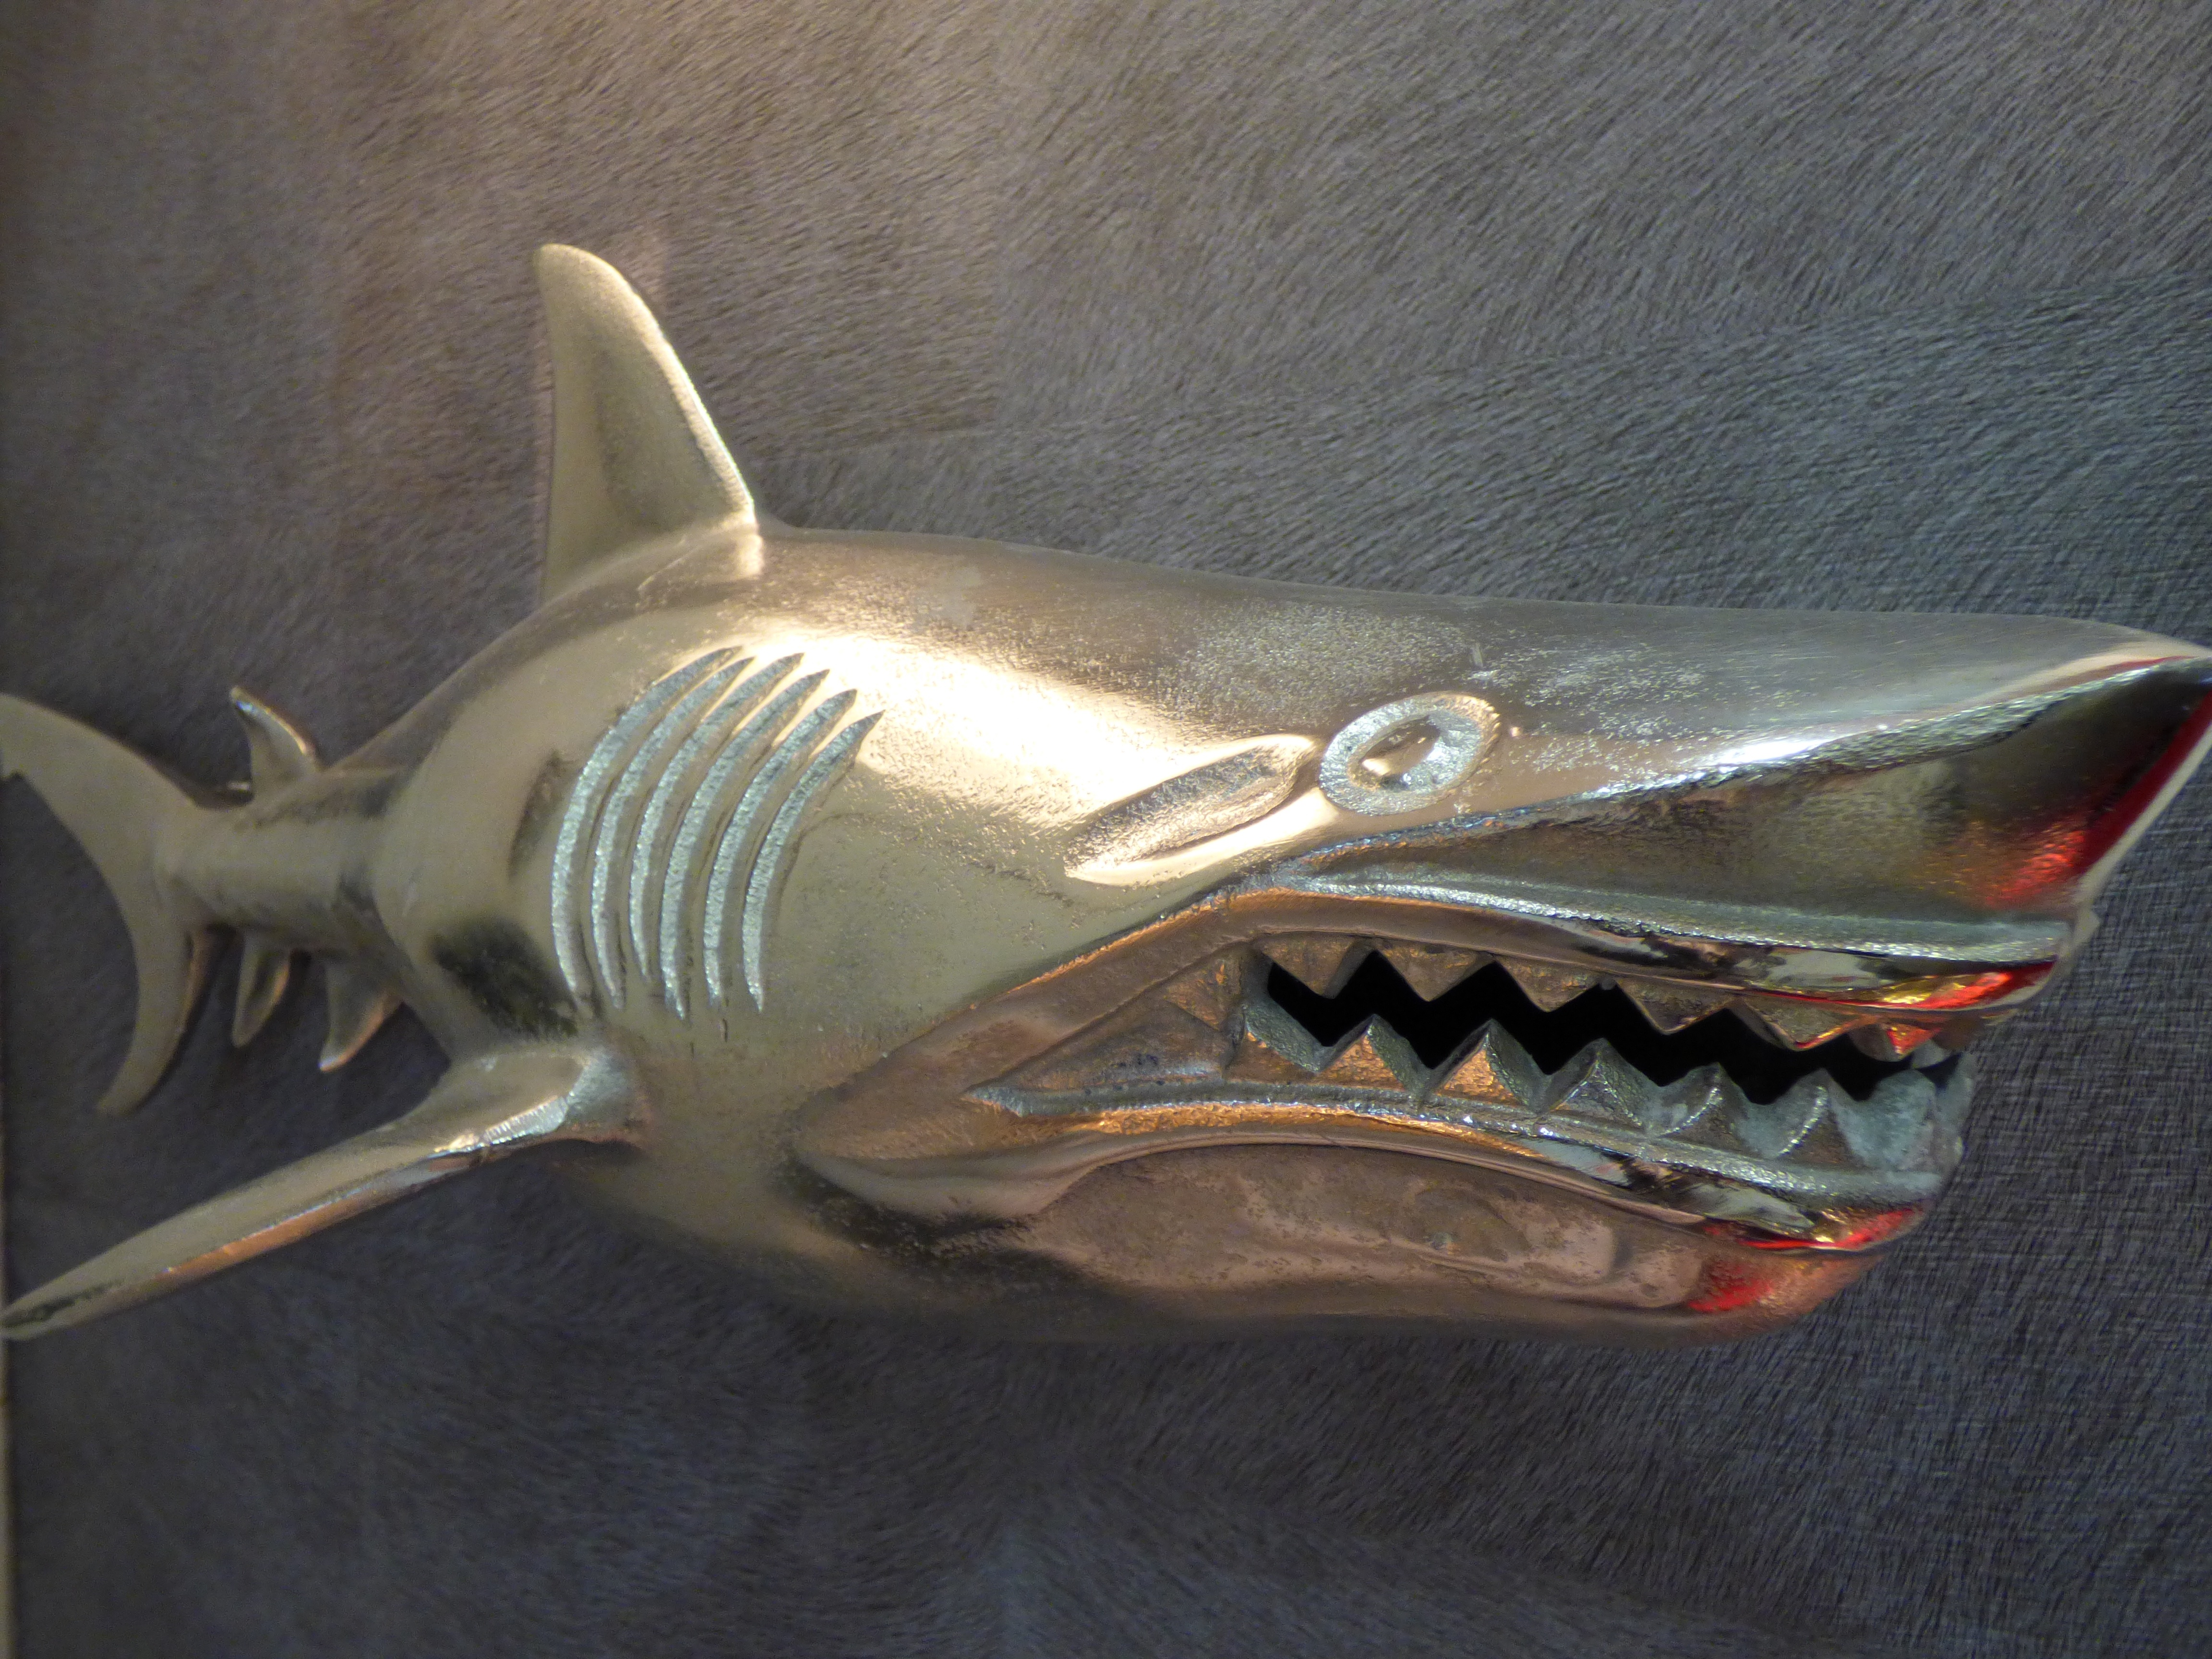 D coration murale requin en m tal home and u home and u for Requin decoration